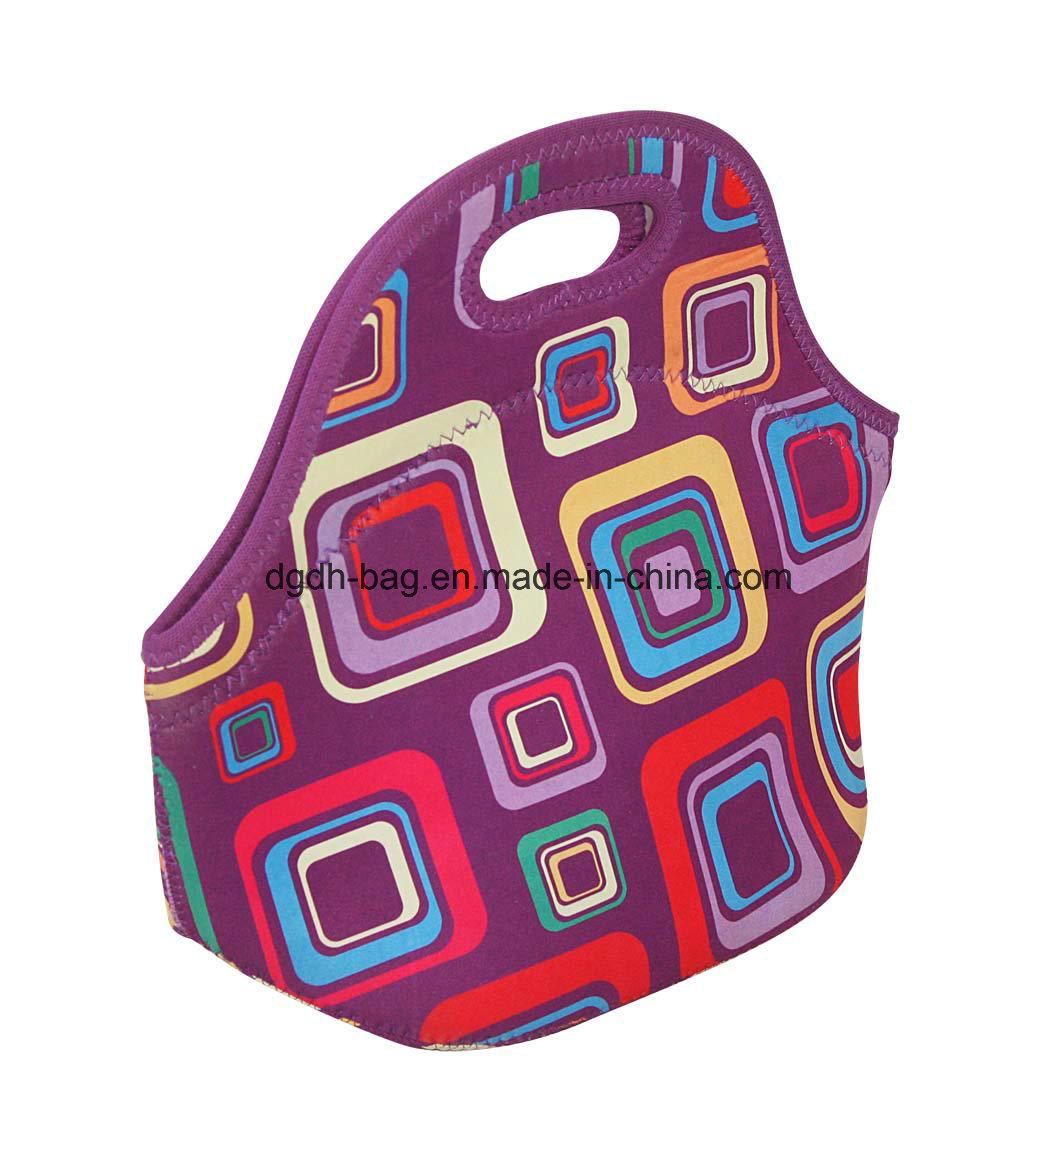 Promotional New Design Tote Cooler Neoprene Lunch Bag Handbags